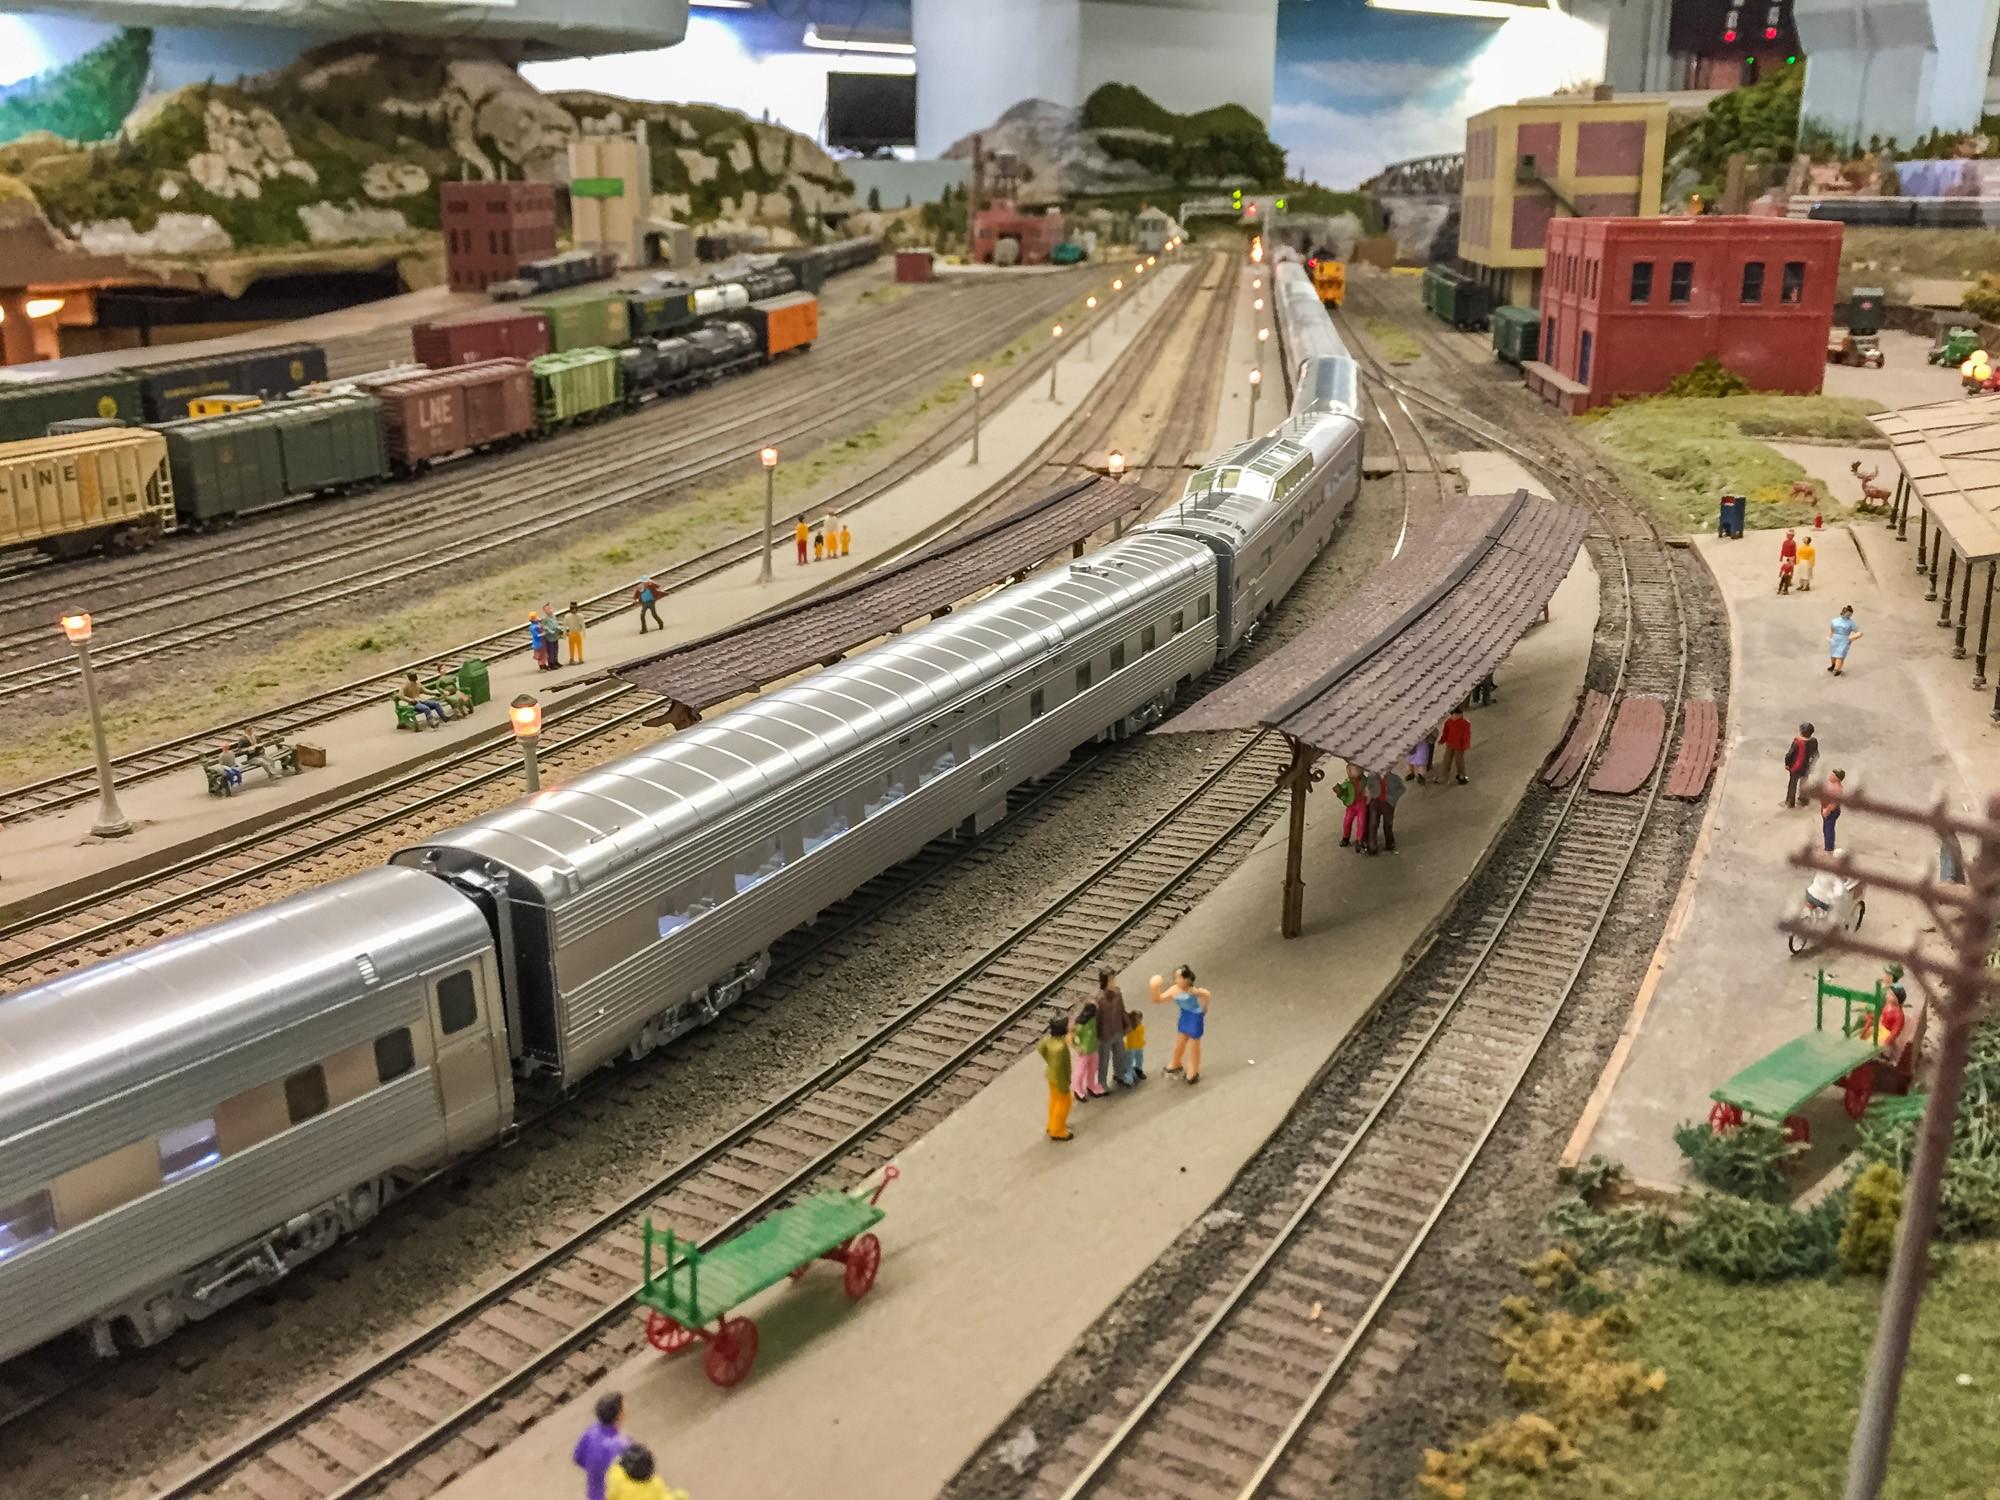 Rod Stewart donates 10 000 after model railway club vandalised